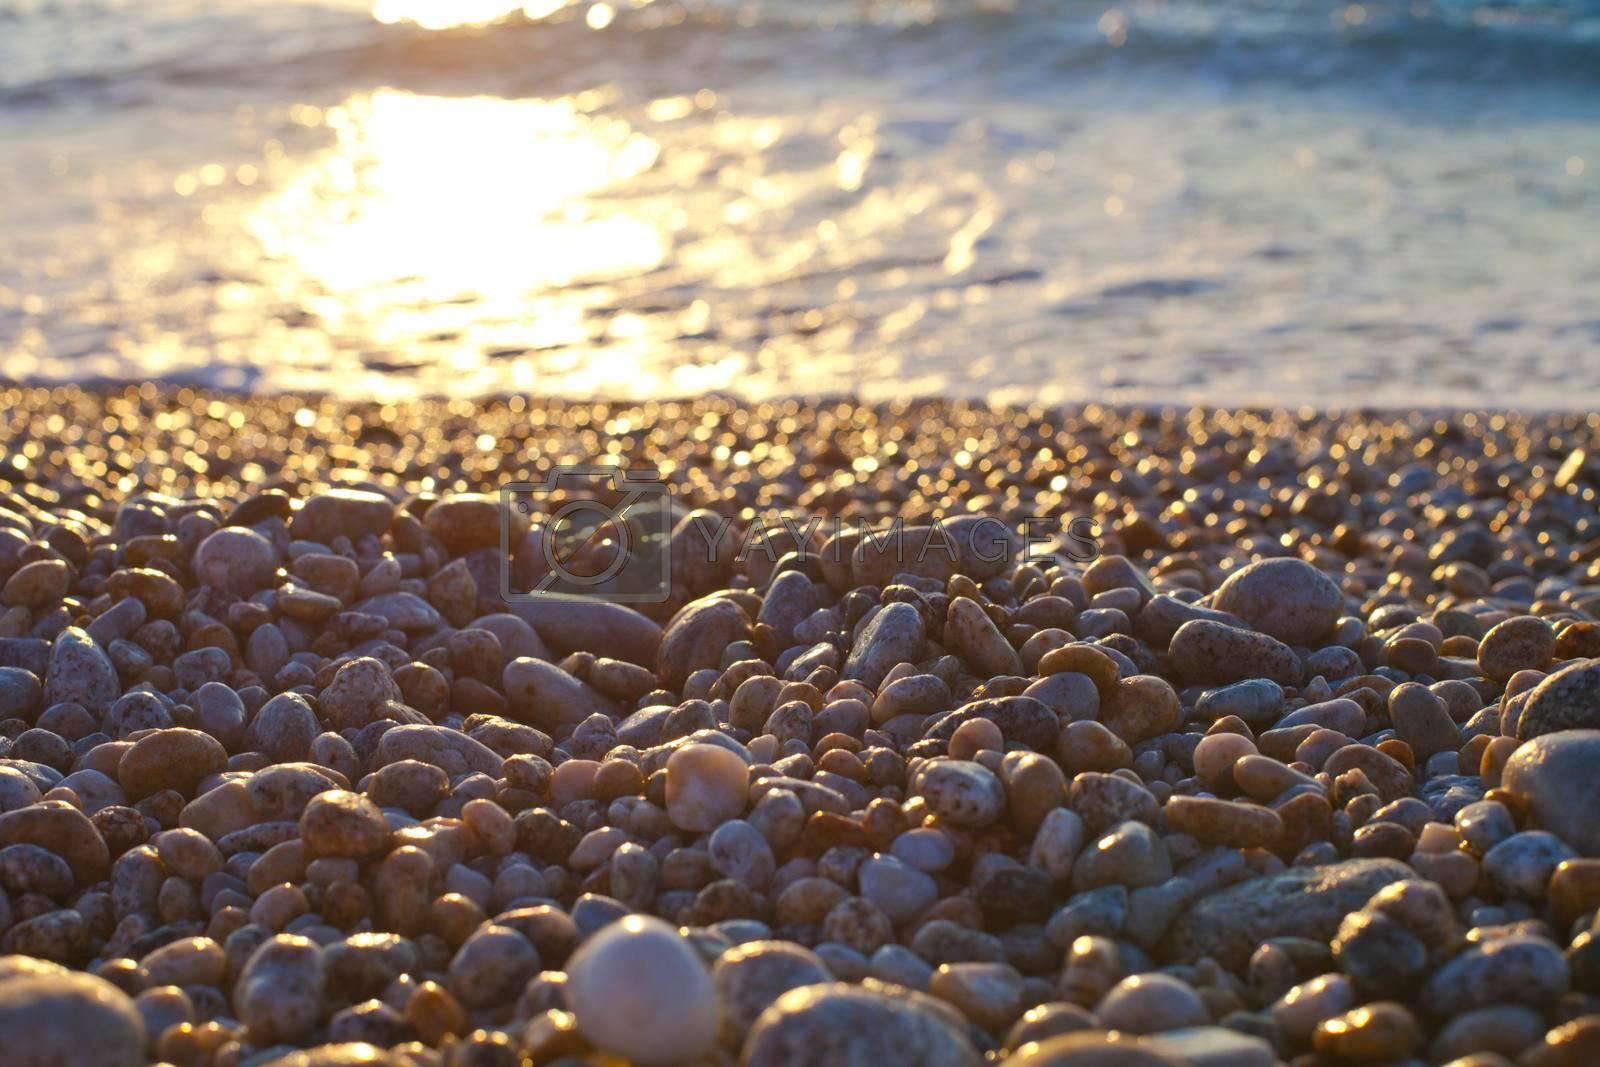 Beautiful seascape, amazing view of pebble coastline in mild sunset light, romantic evening on the beach.